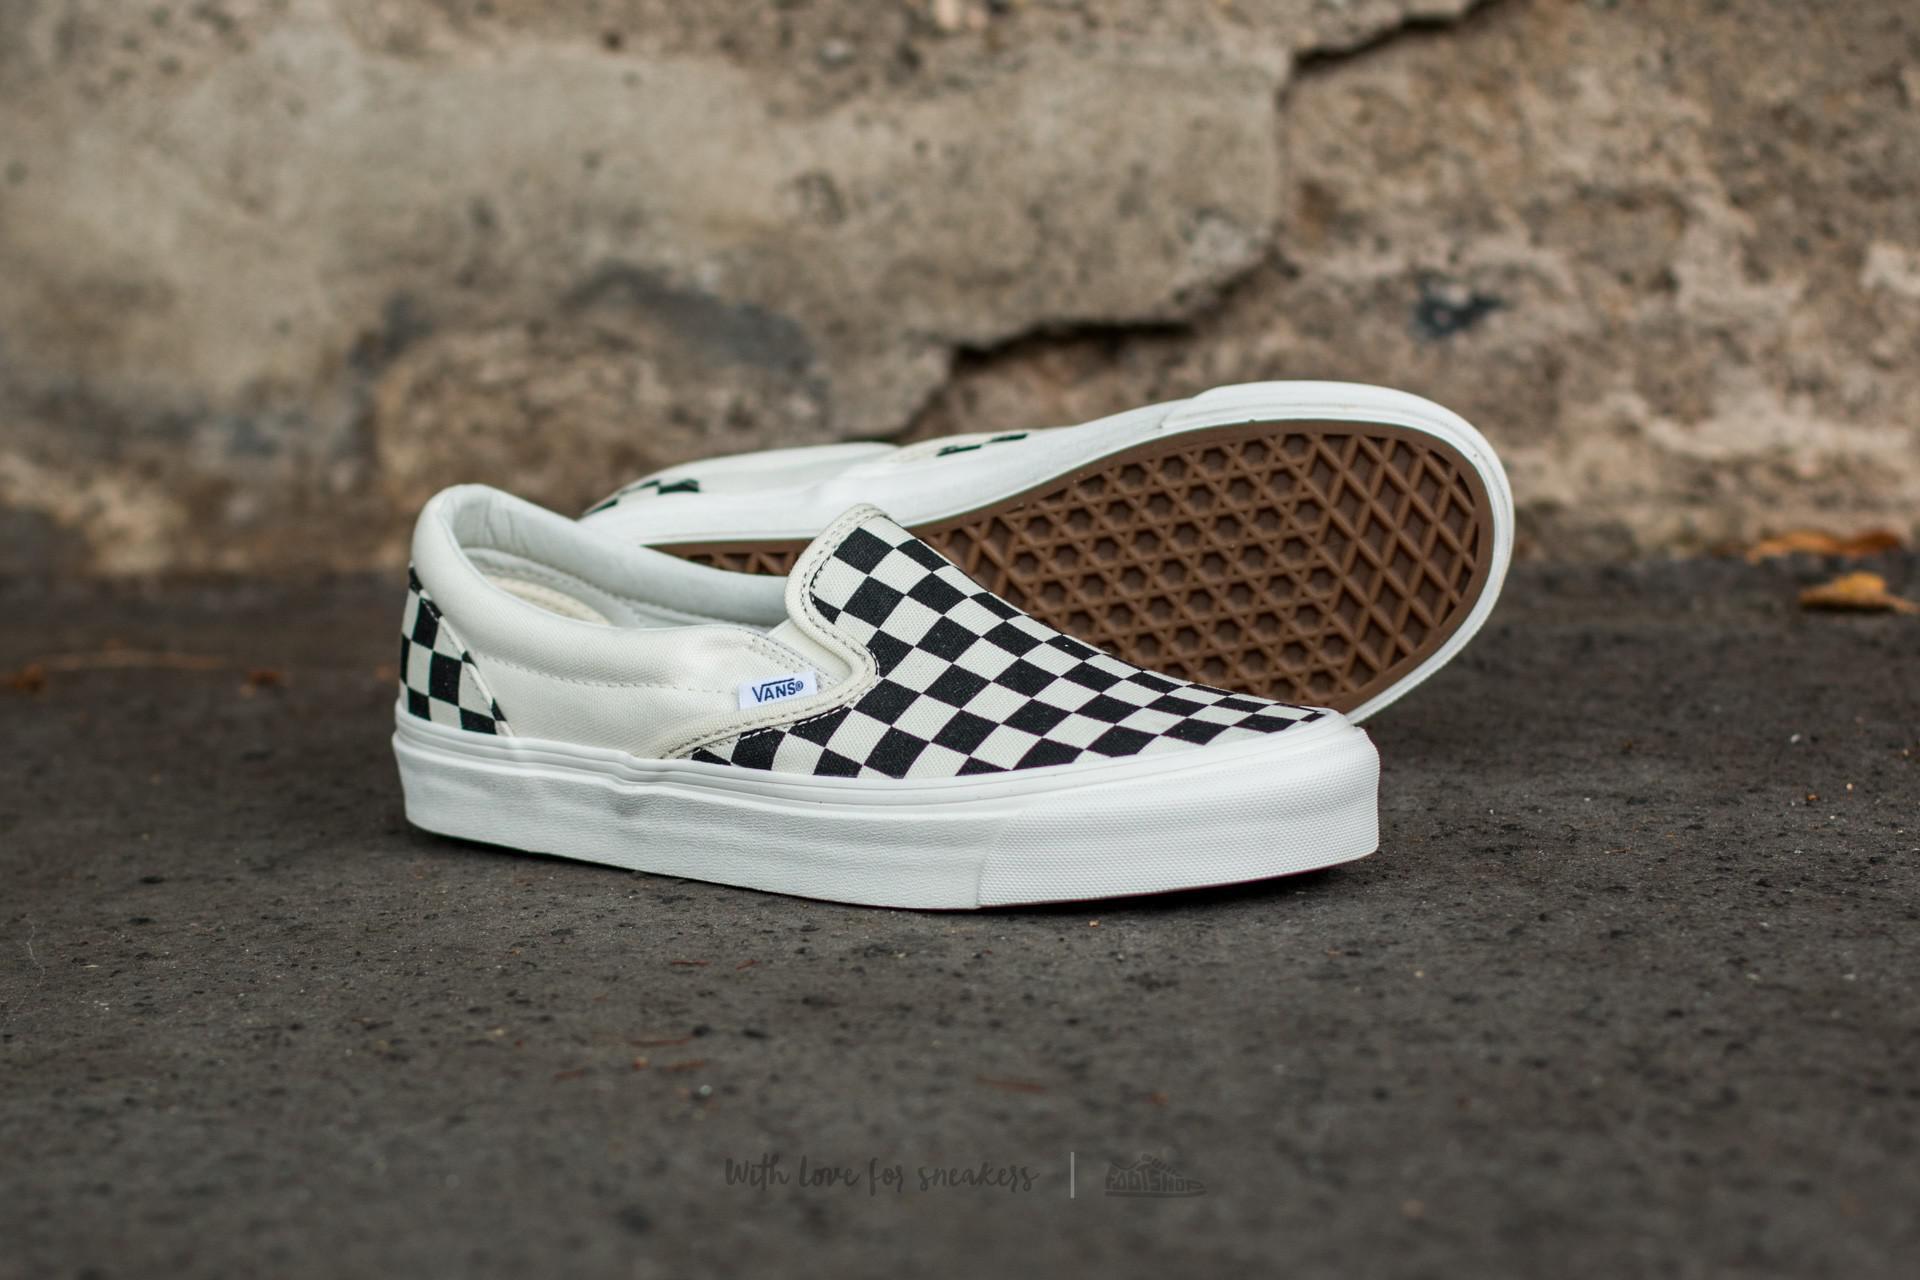 Vans - Multicolor Og Classic Slip On Lx (canvas) Black  White Checkerboard  for. View fullscreen d283f25df